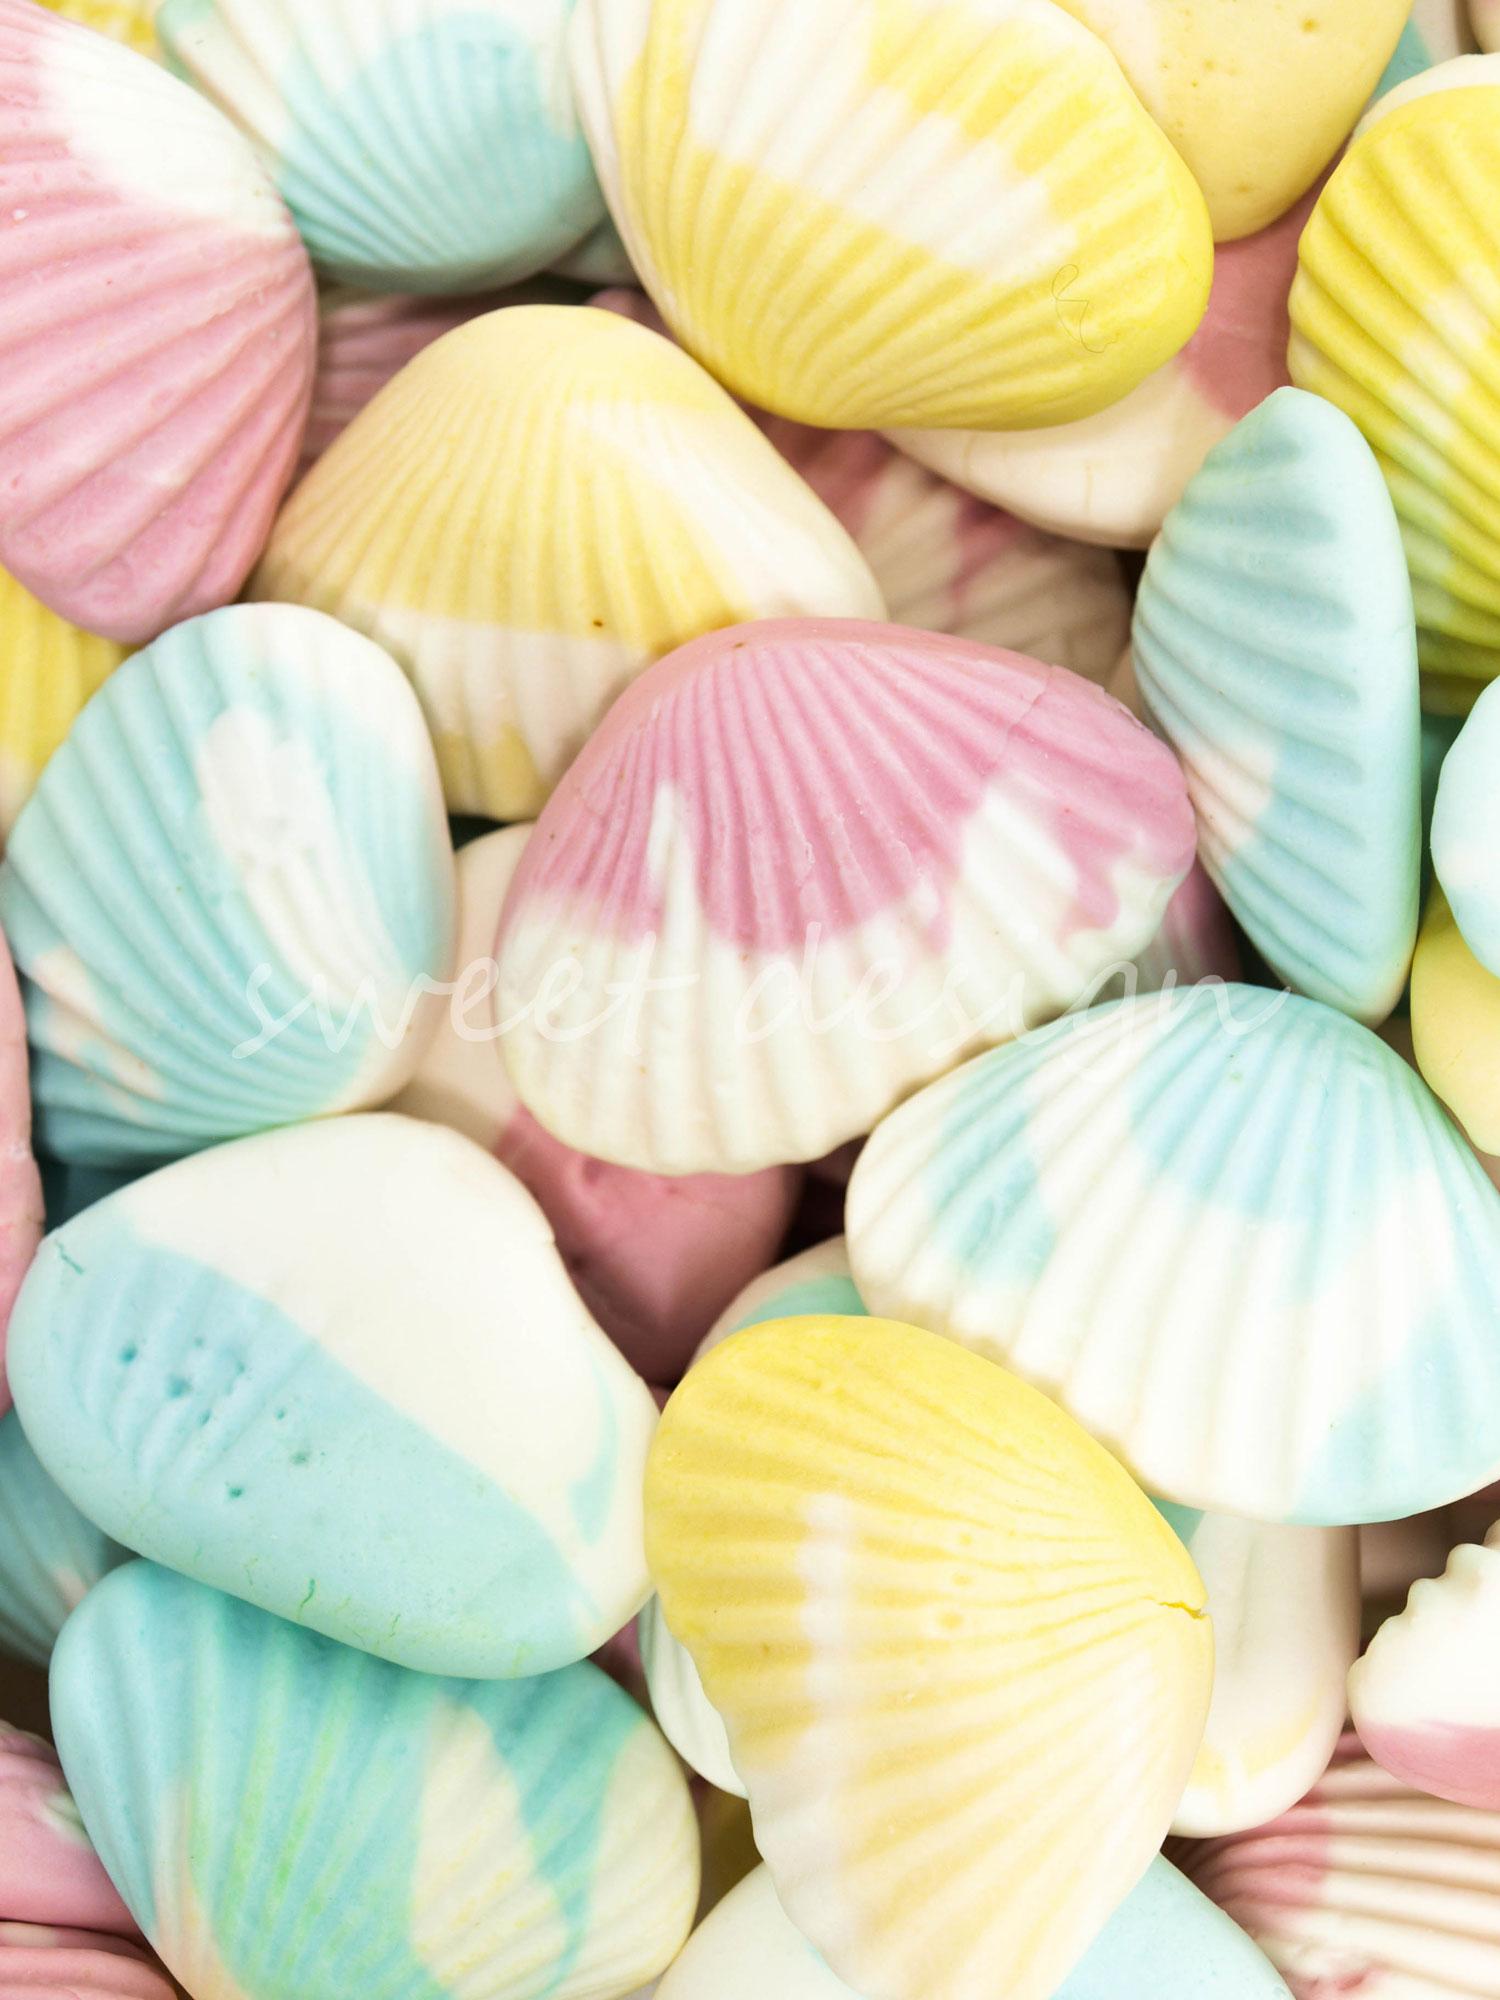 Conchas De Mar Sweet Design Conchas De Mar Chuches Multicolor - Fotos-de-conchas-de-mar